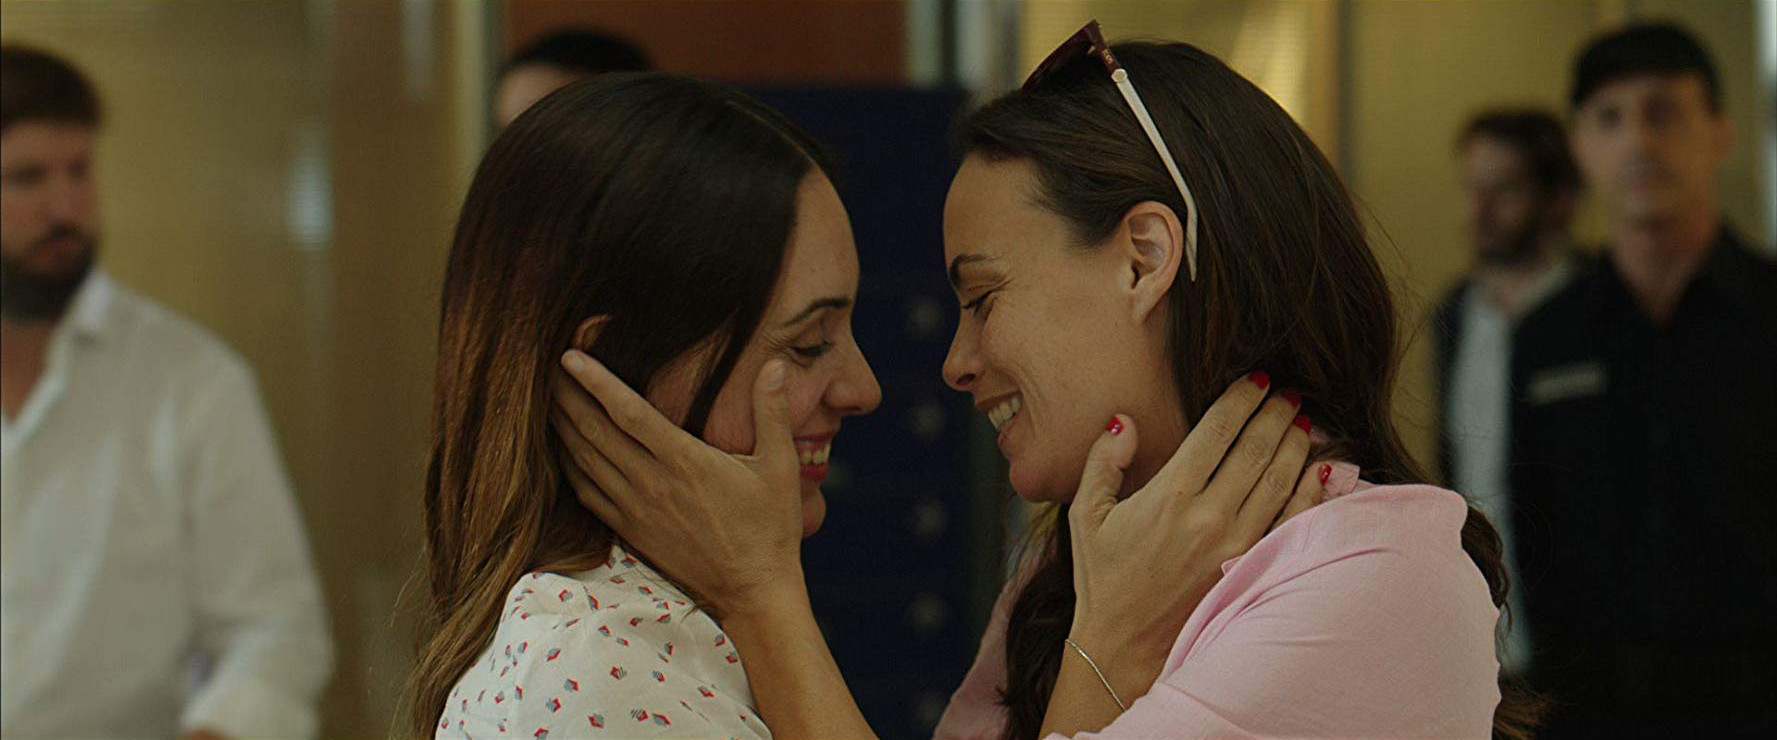 Bérénice Bejo e Martina Gusmán